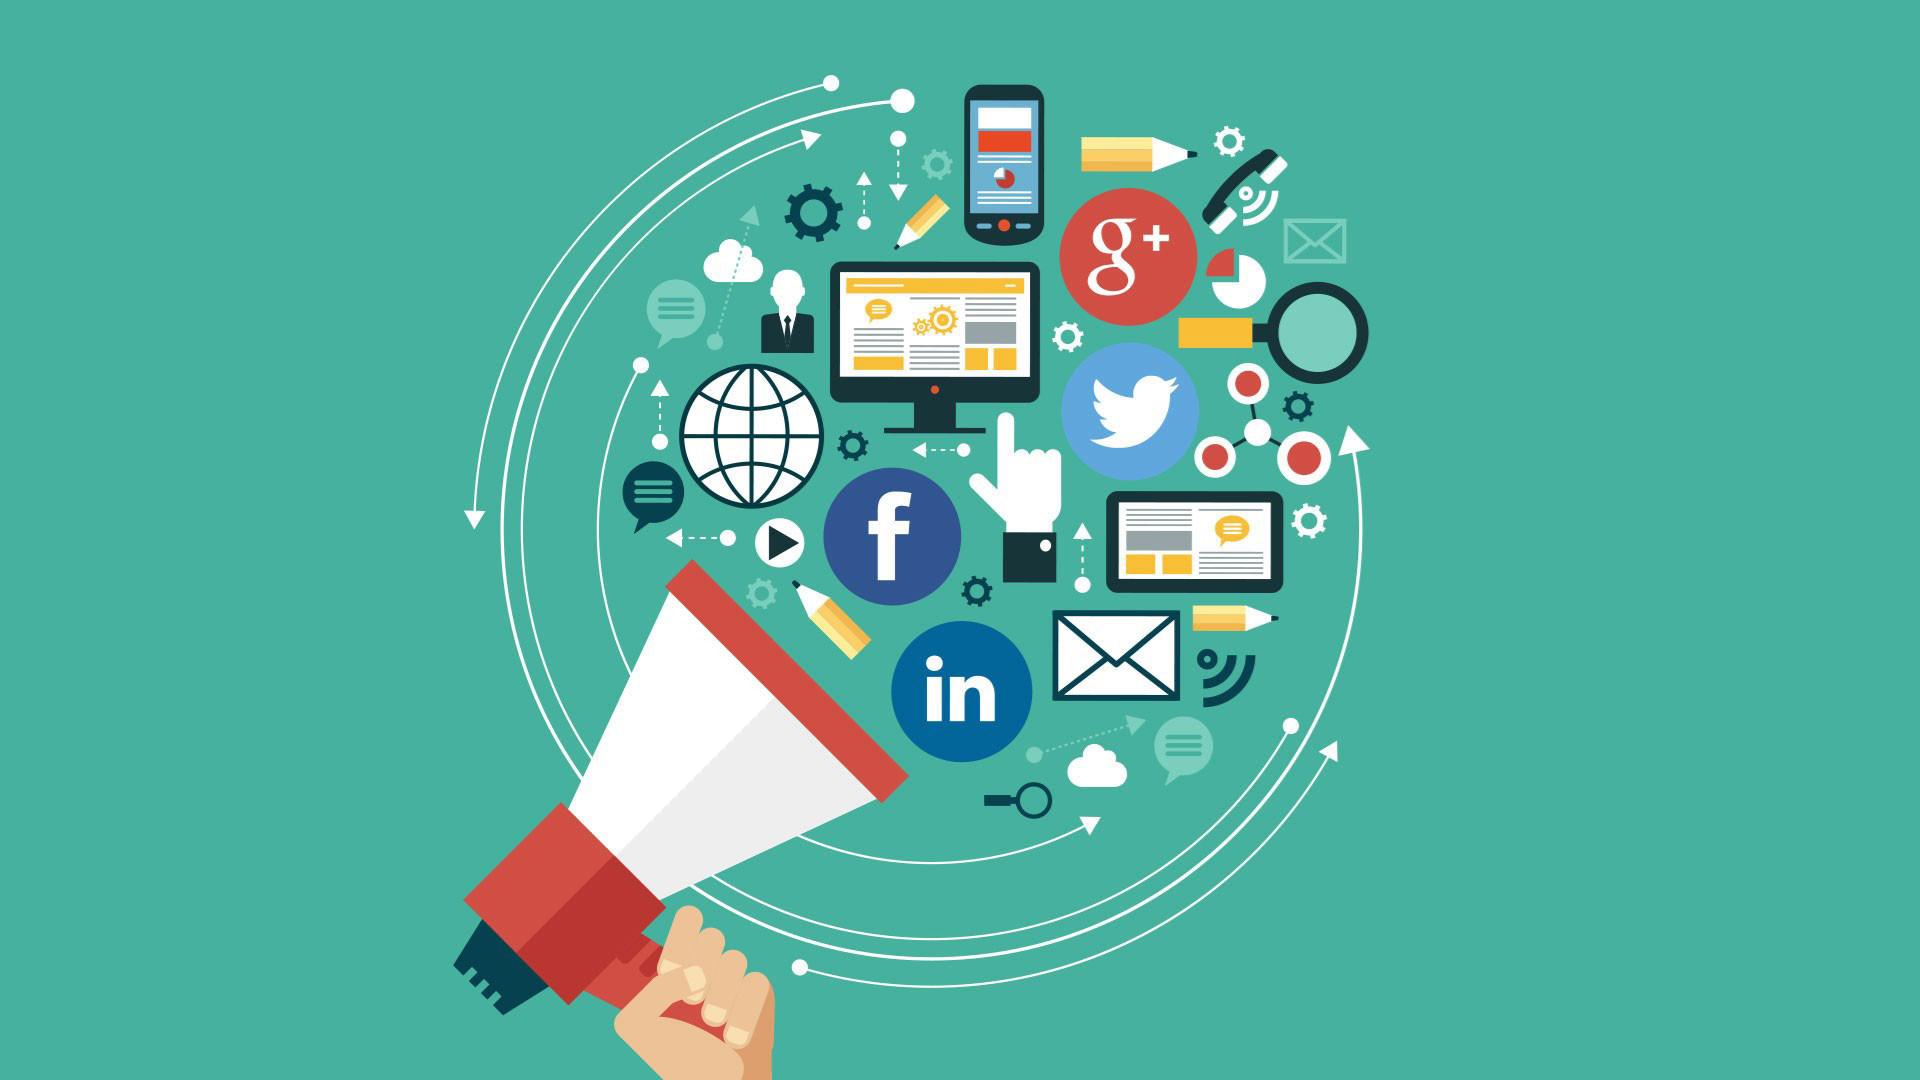 Preview wallpaper social networking, media, logos 1920x1080 1920x1080.  1920x1080